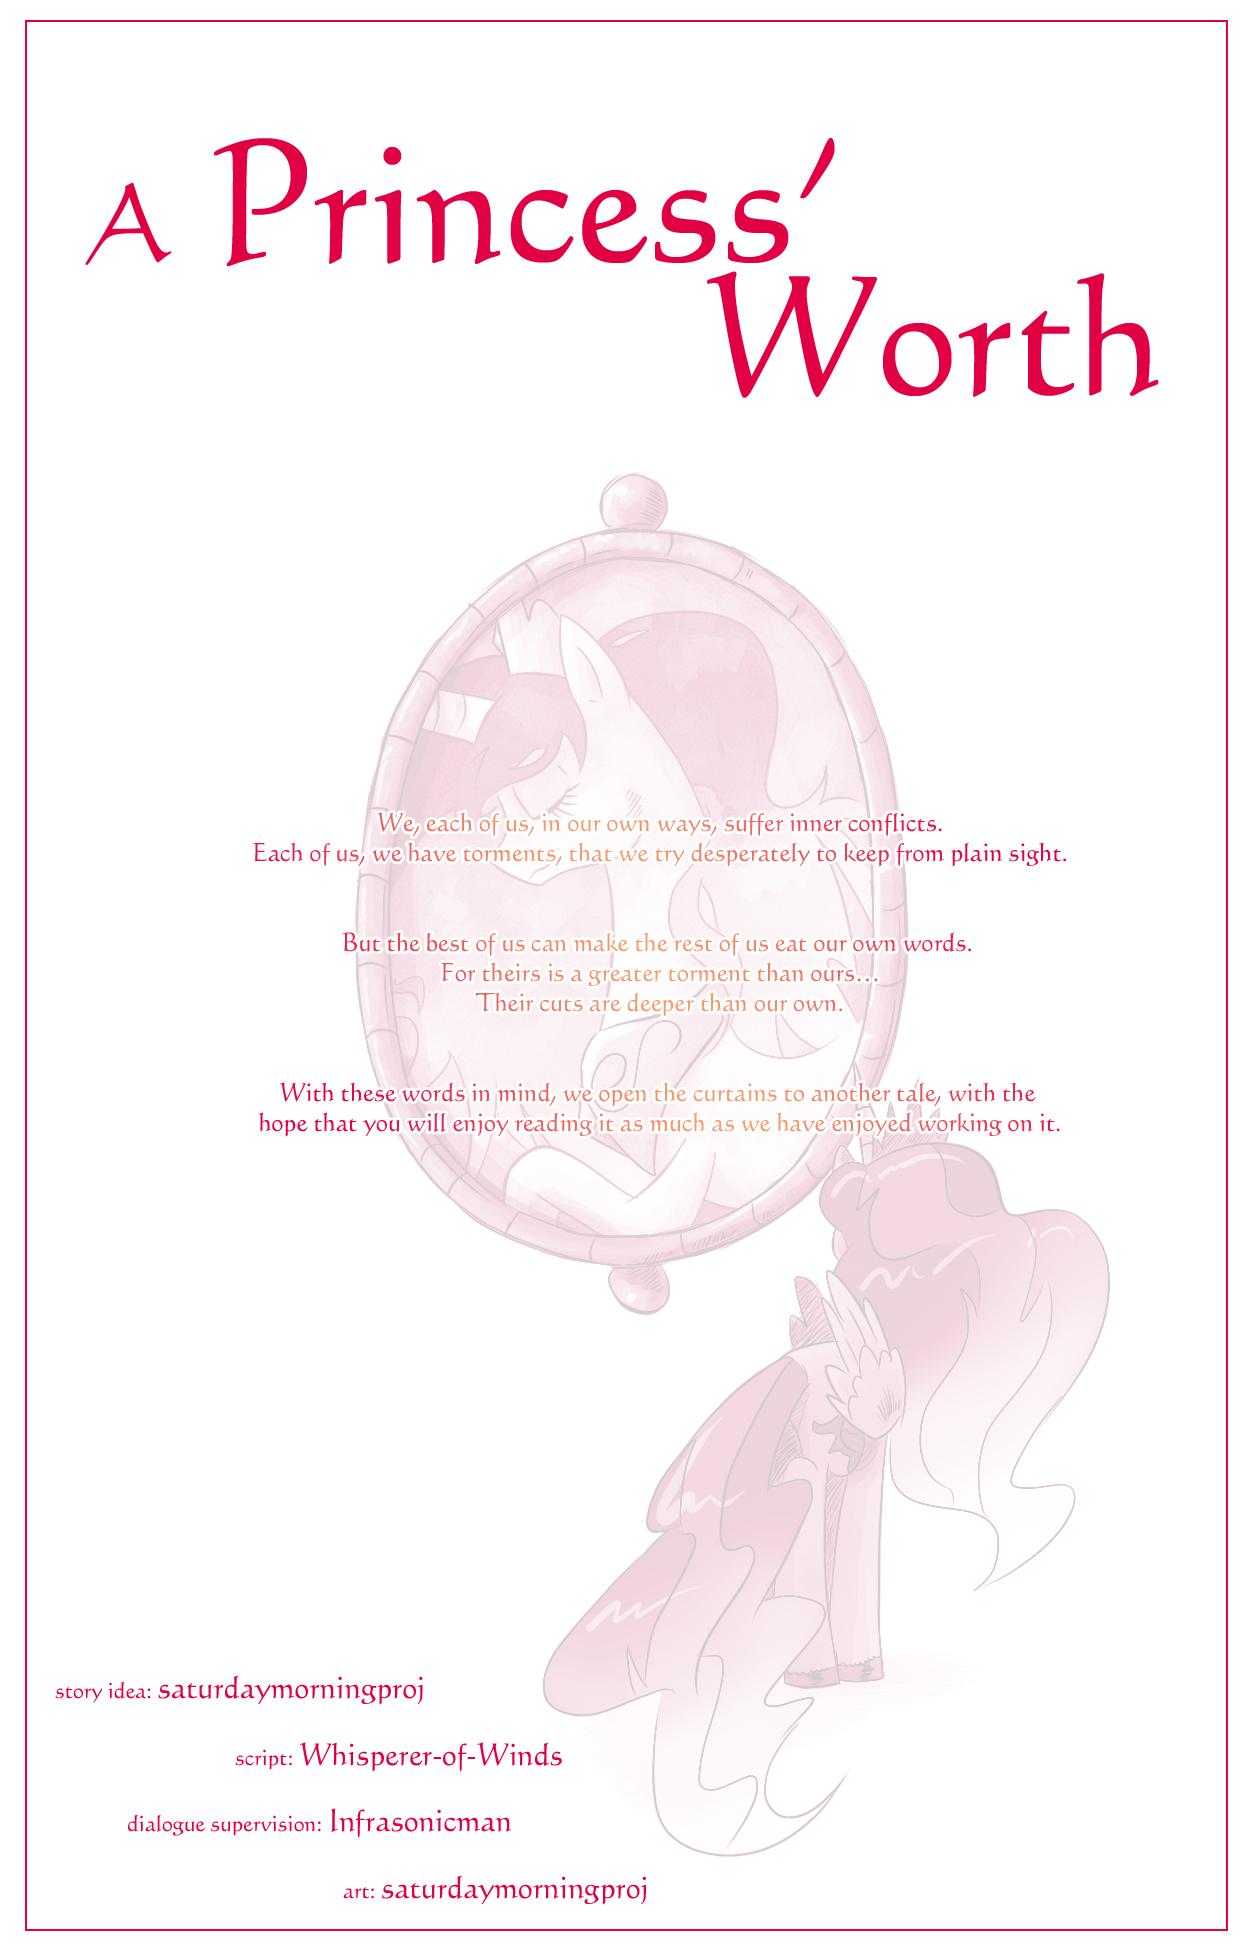 A Princess' Worth Introduction